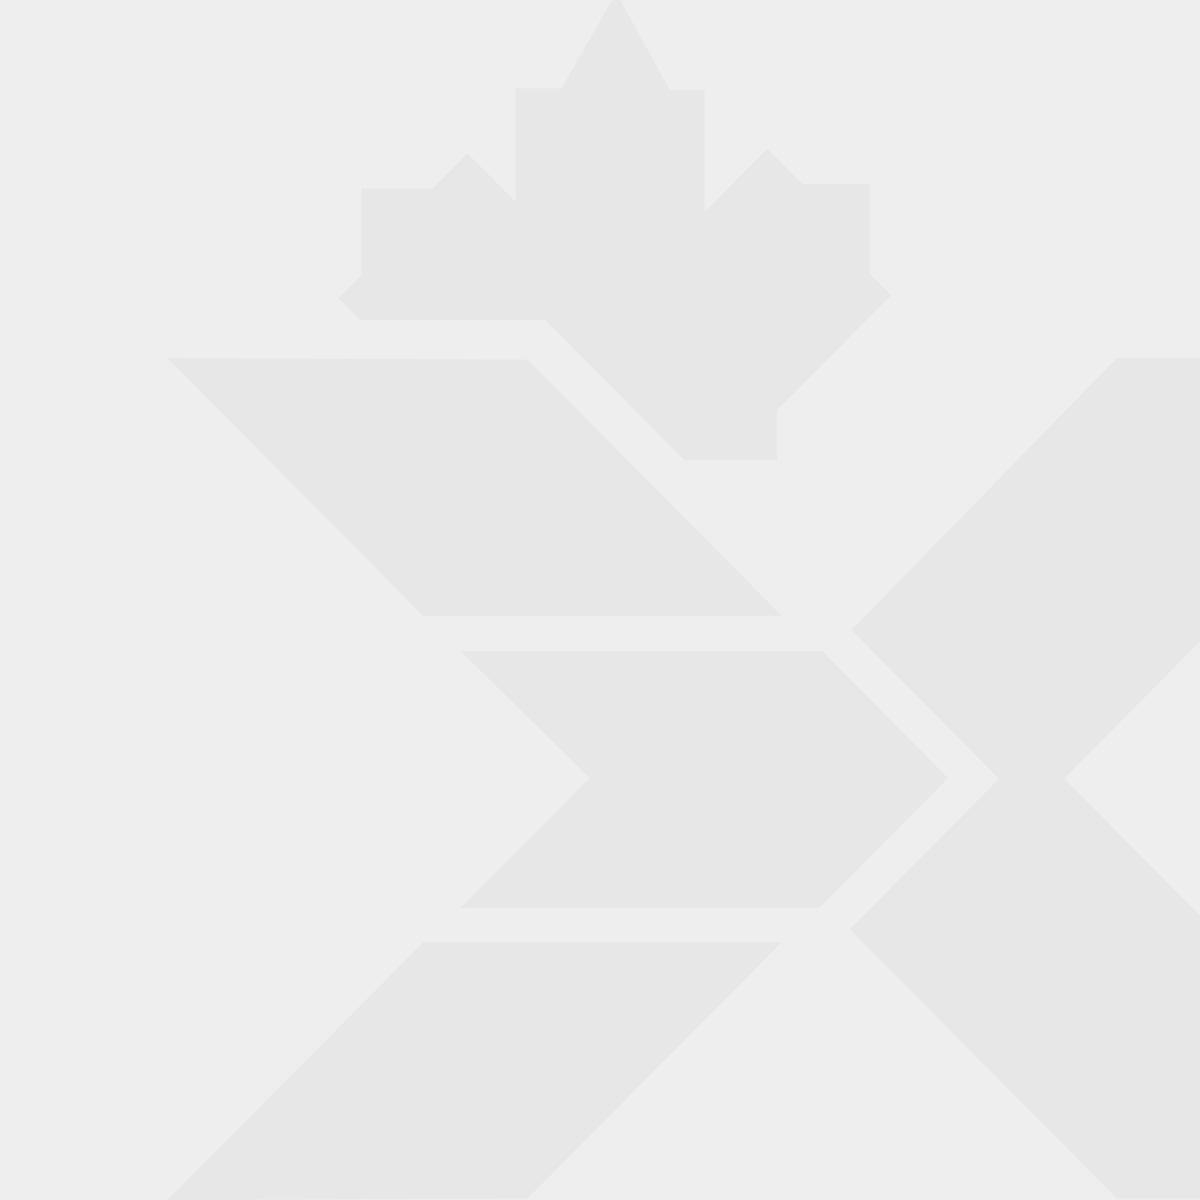 CINEPLEX Admit One